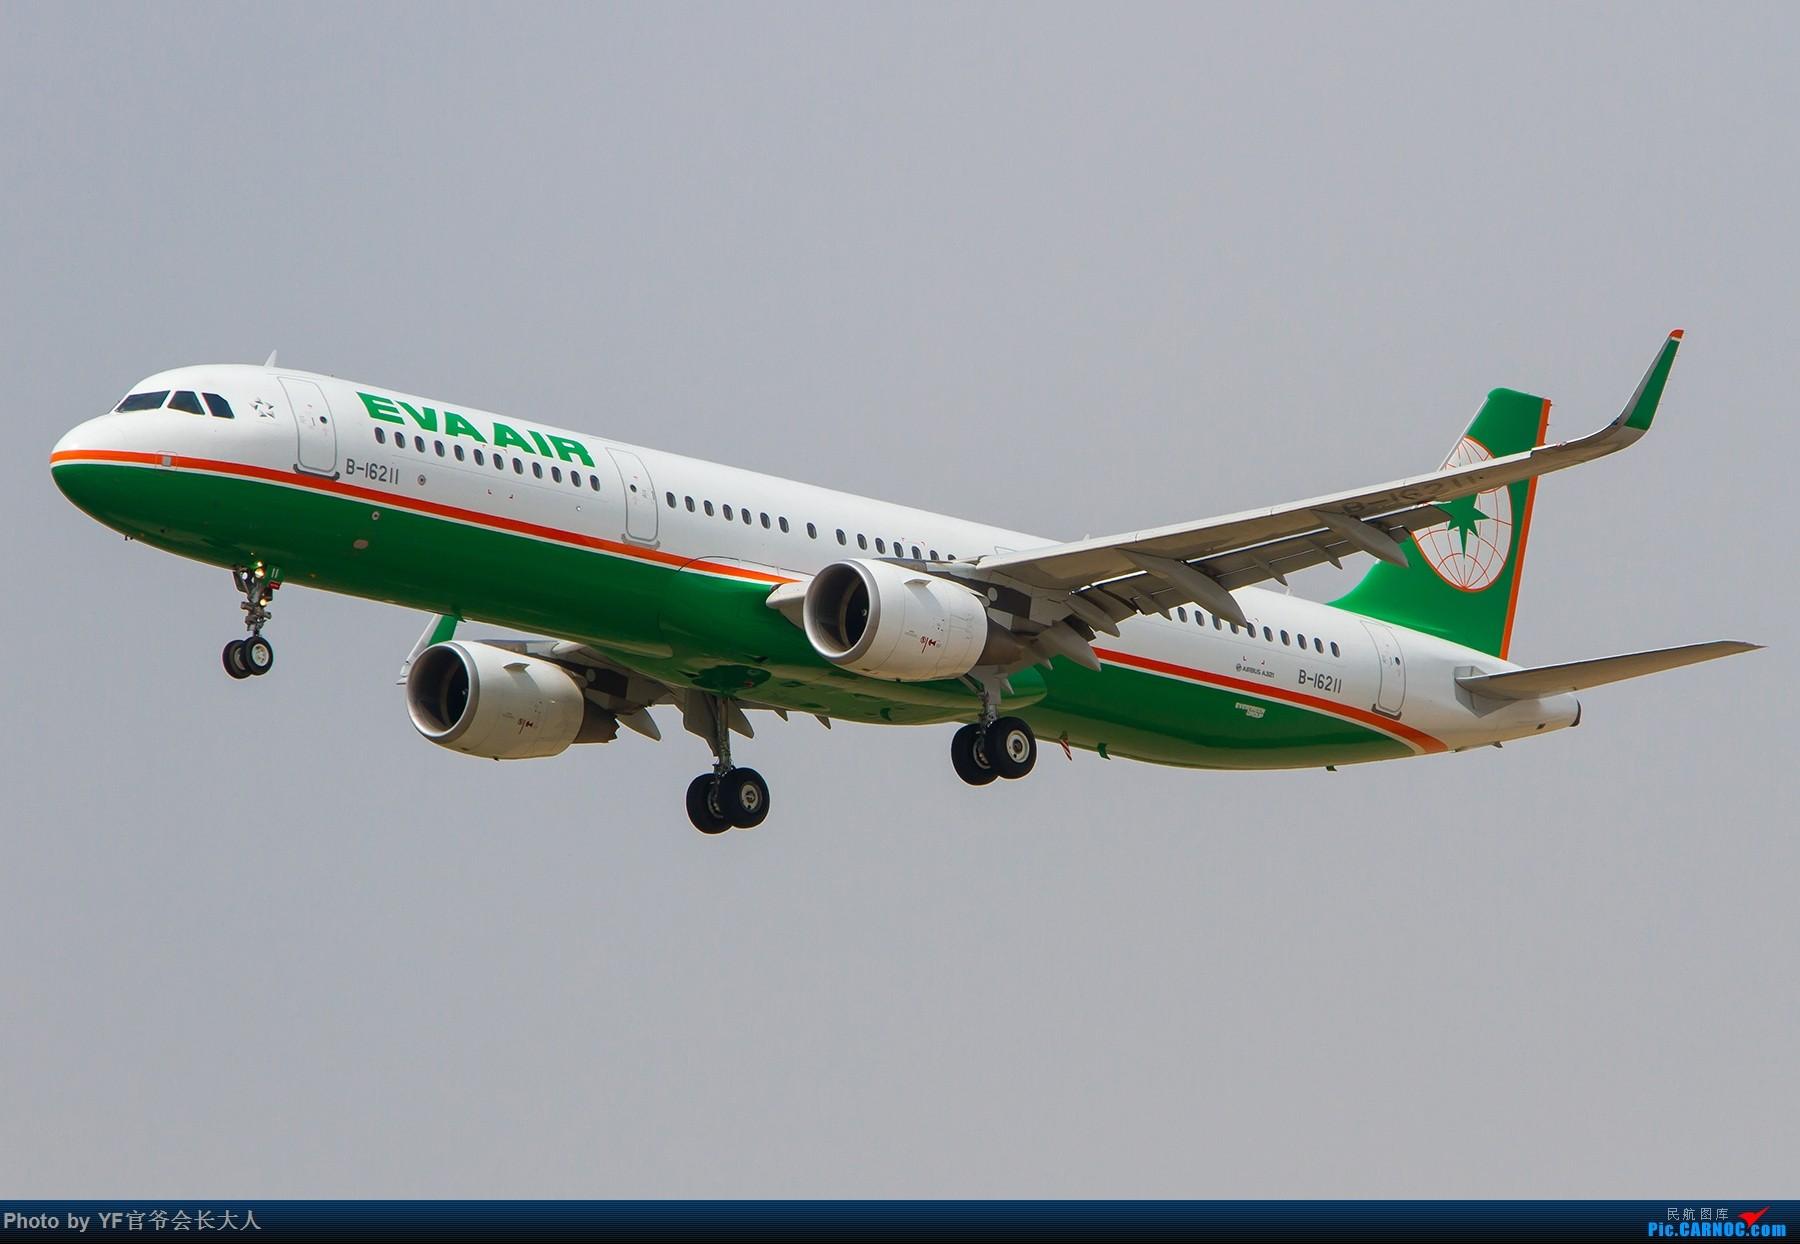 Re:[原创]【ZYTX】轻易不拍机,拍就要拍个过瘾!(新开的酷鸟,亚洲大西洋,顺带碰上朝韩两国的好货) AIRBUS A321-200 B-16211 中国沈阳桃仙国际机场